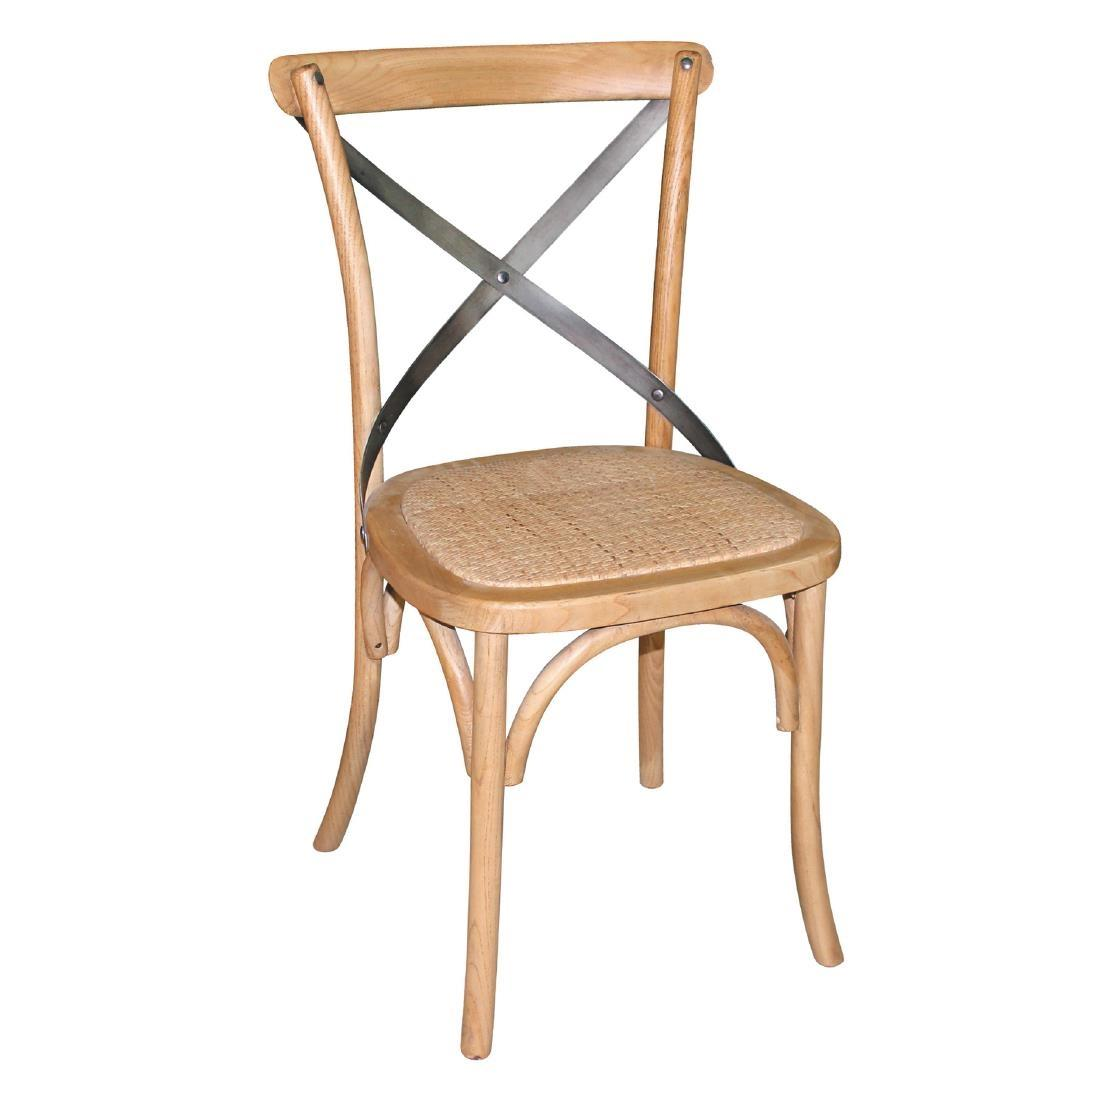 Juego de 2 sillas de madera con respaldo en cruz color natural Bolero GG656